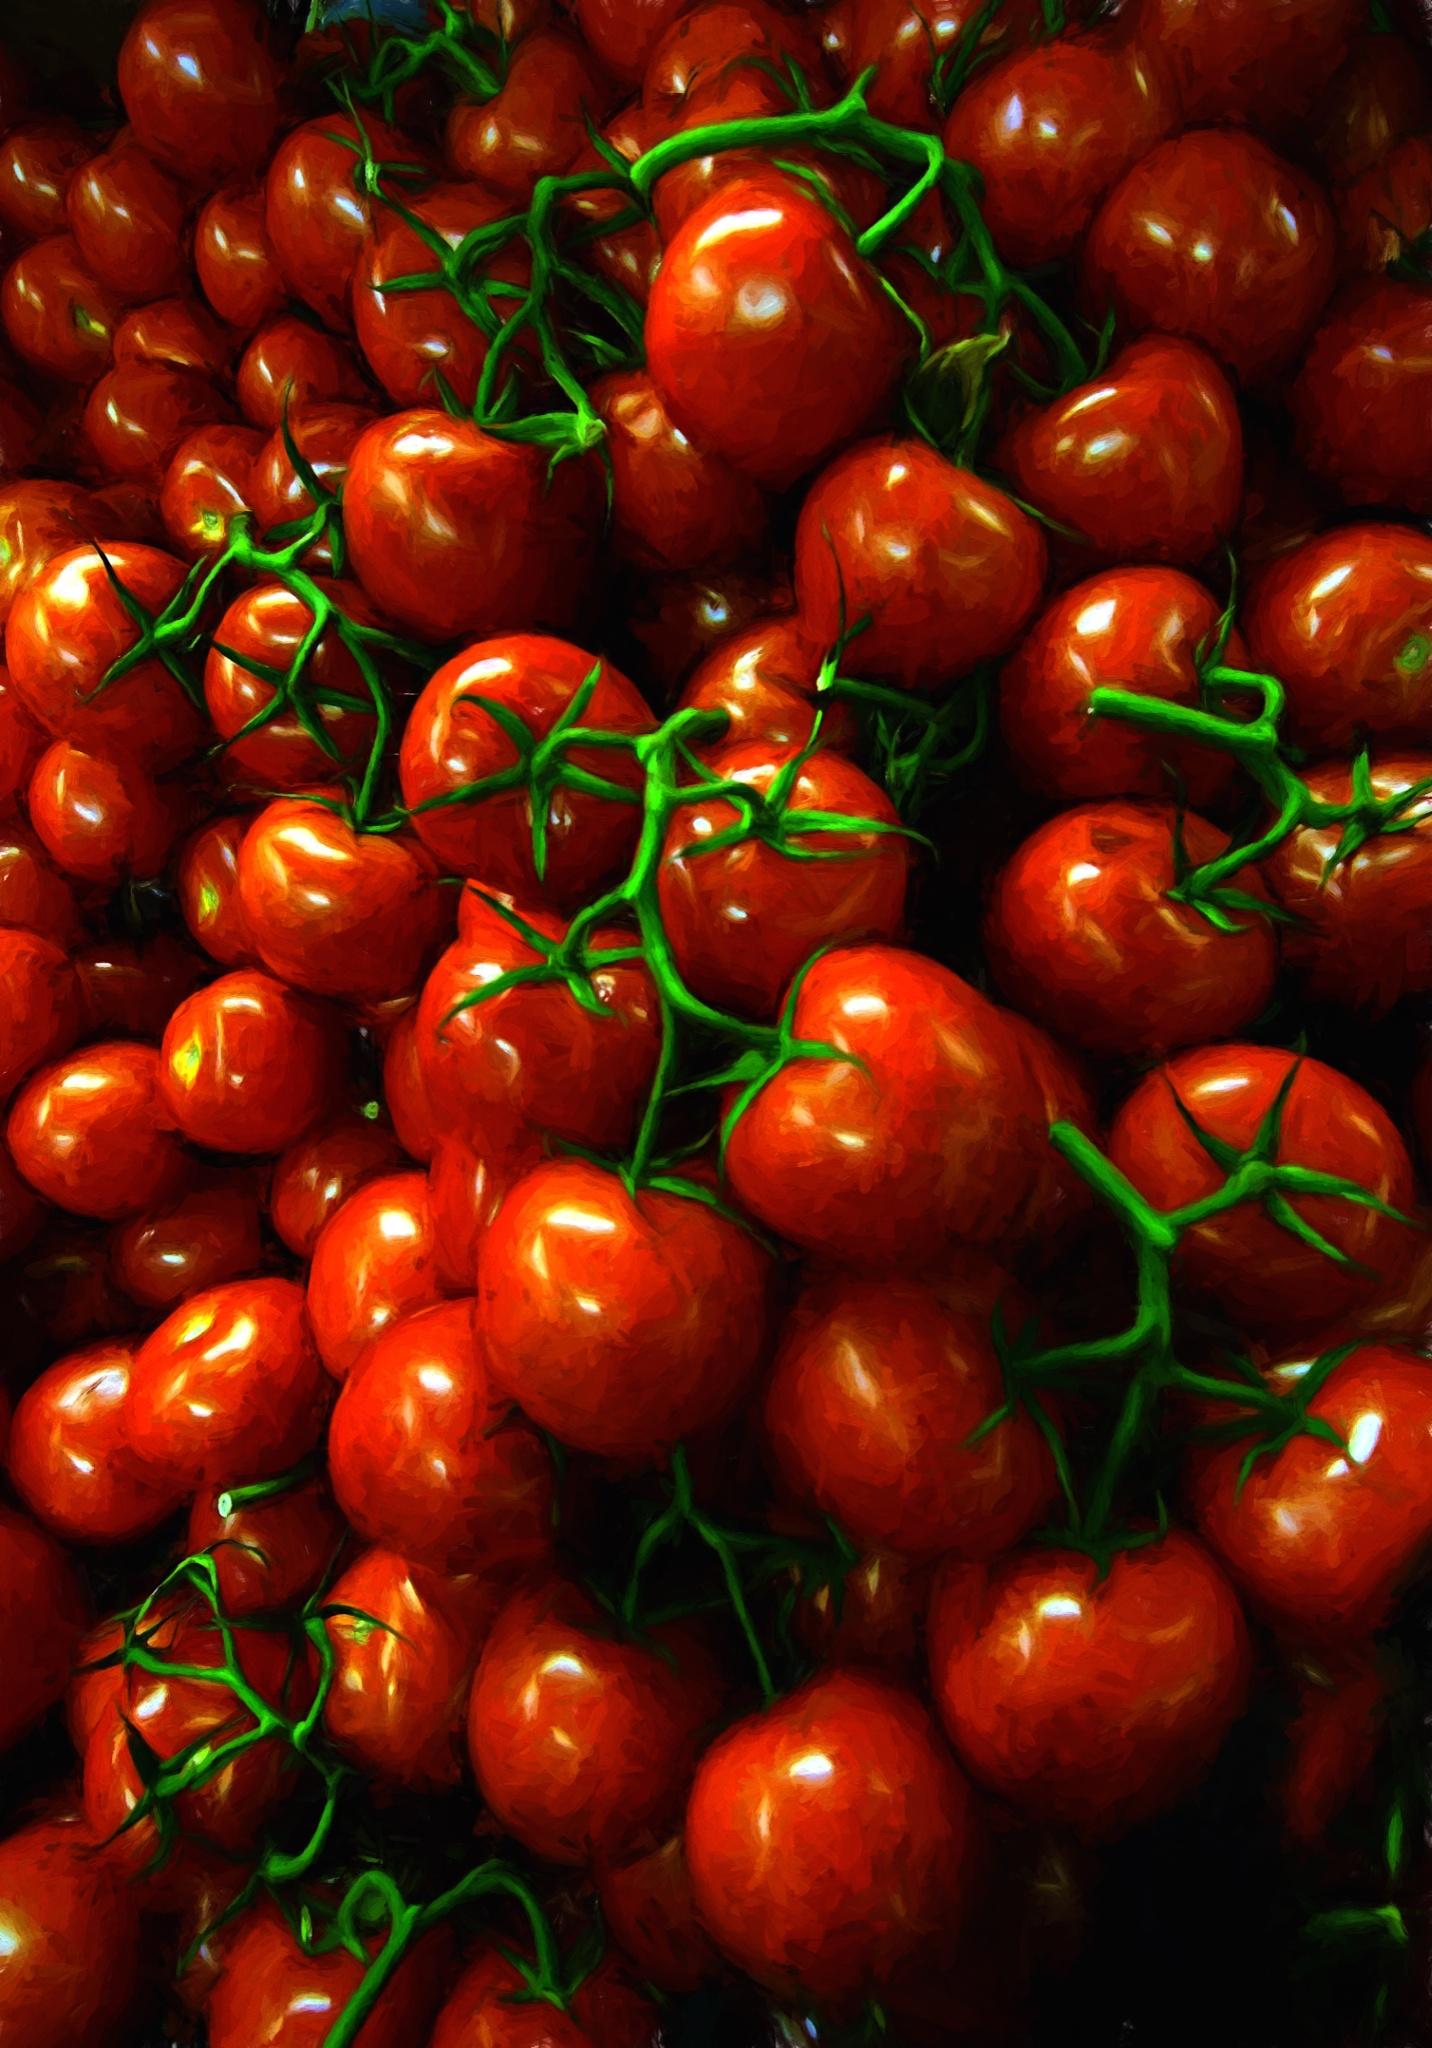 Tomatos by Goran Jorganovich